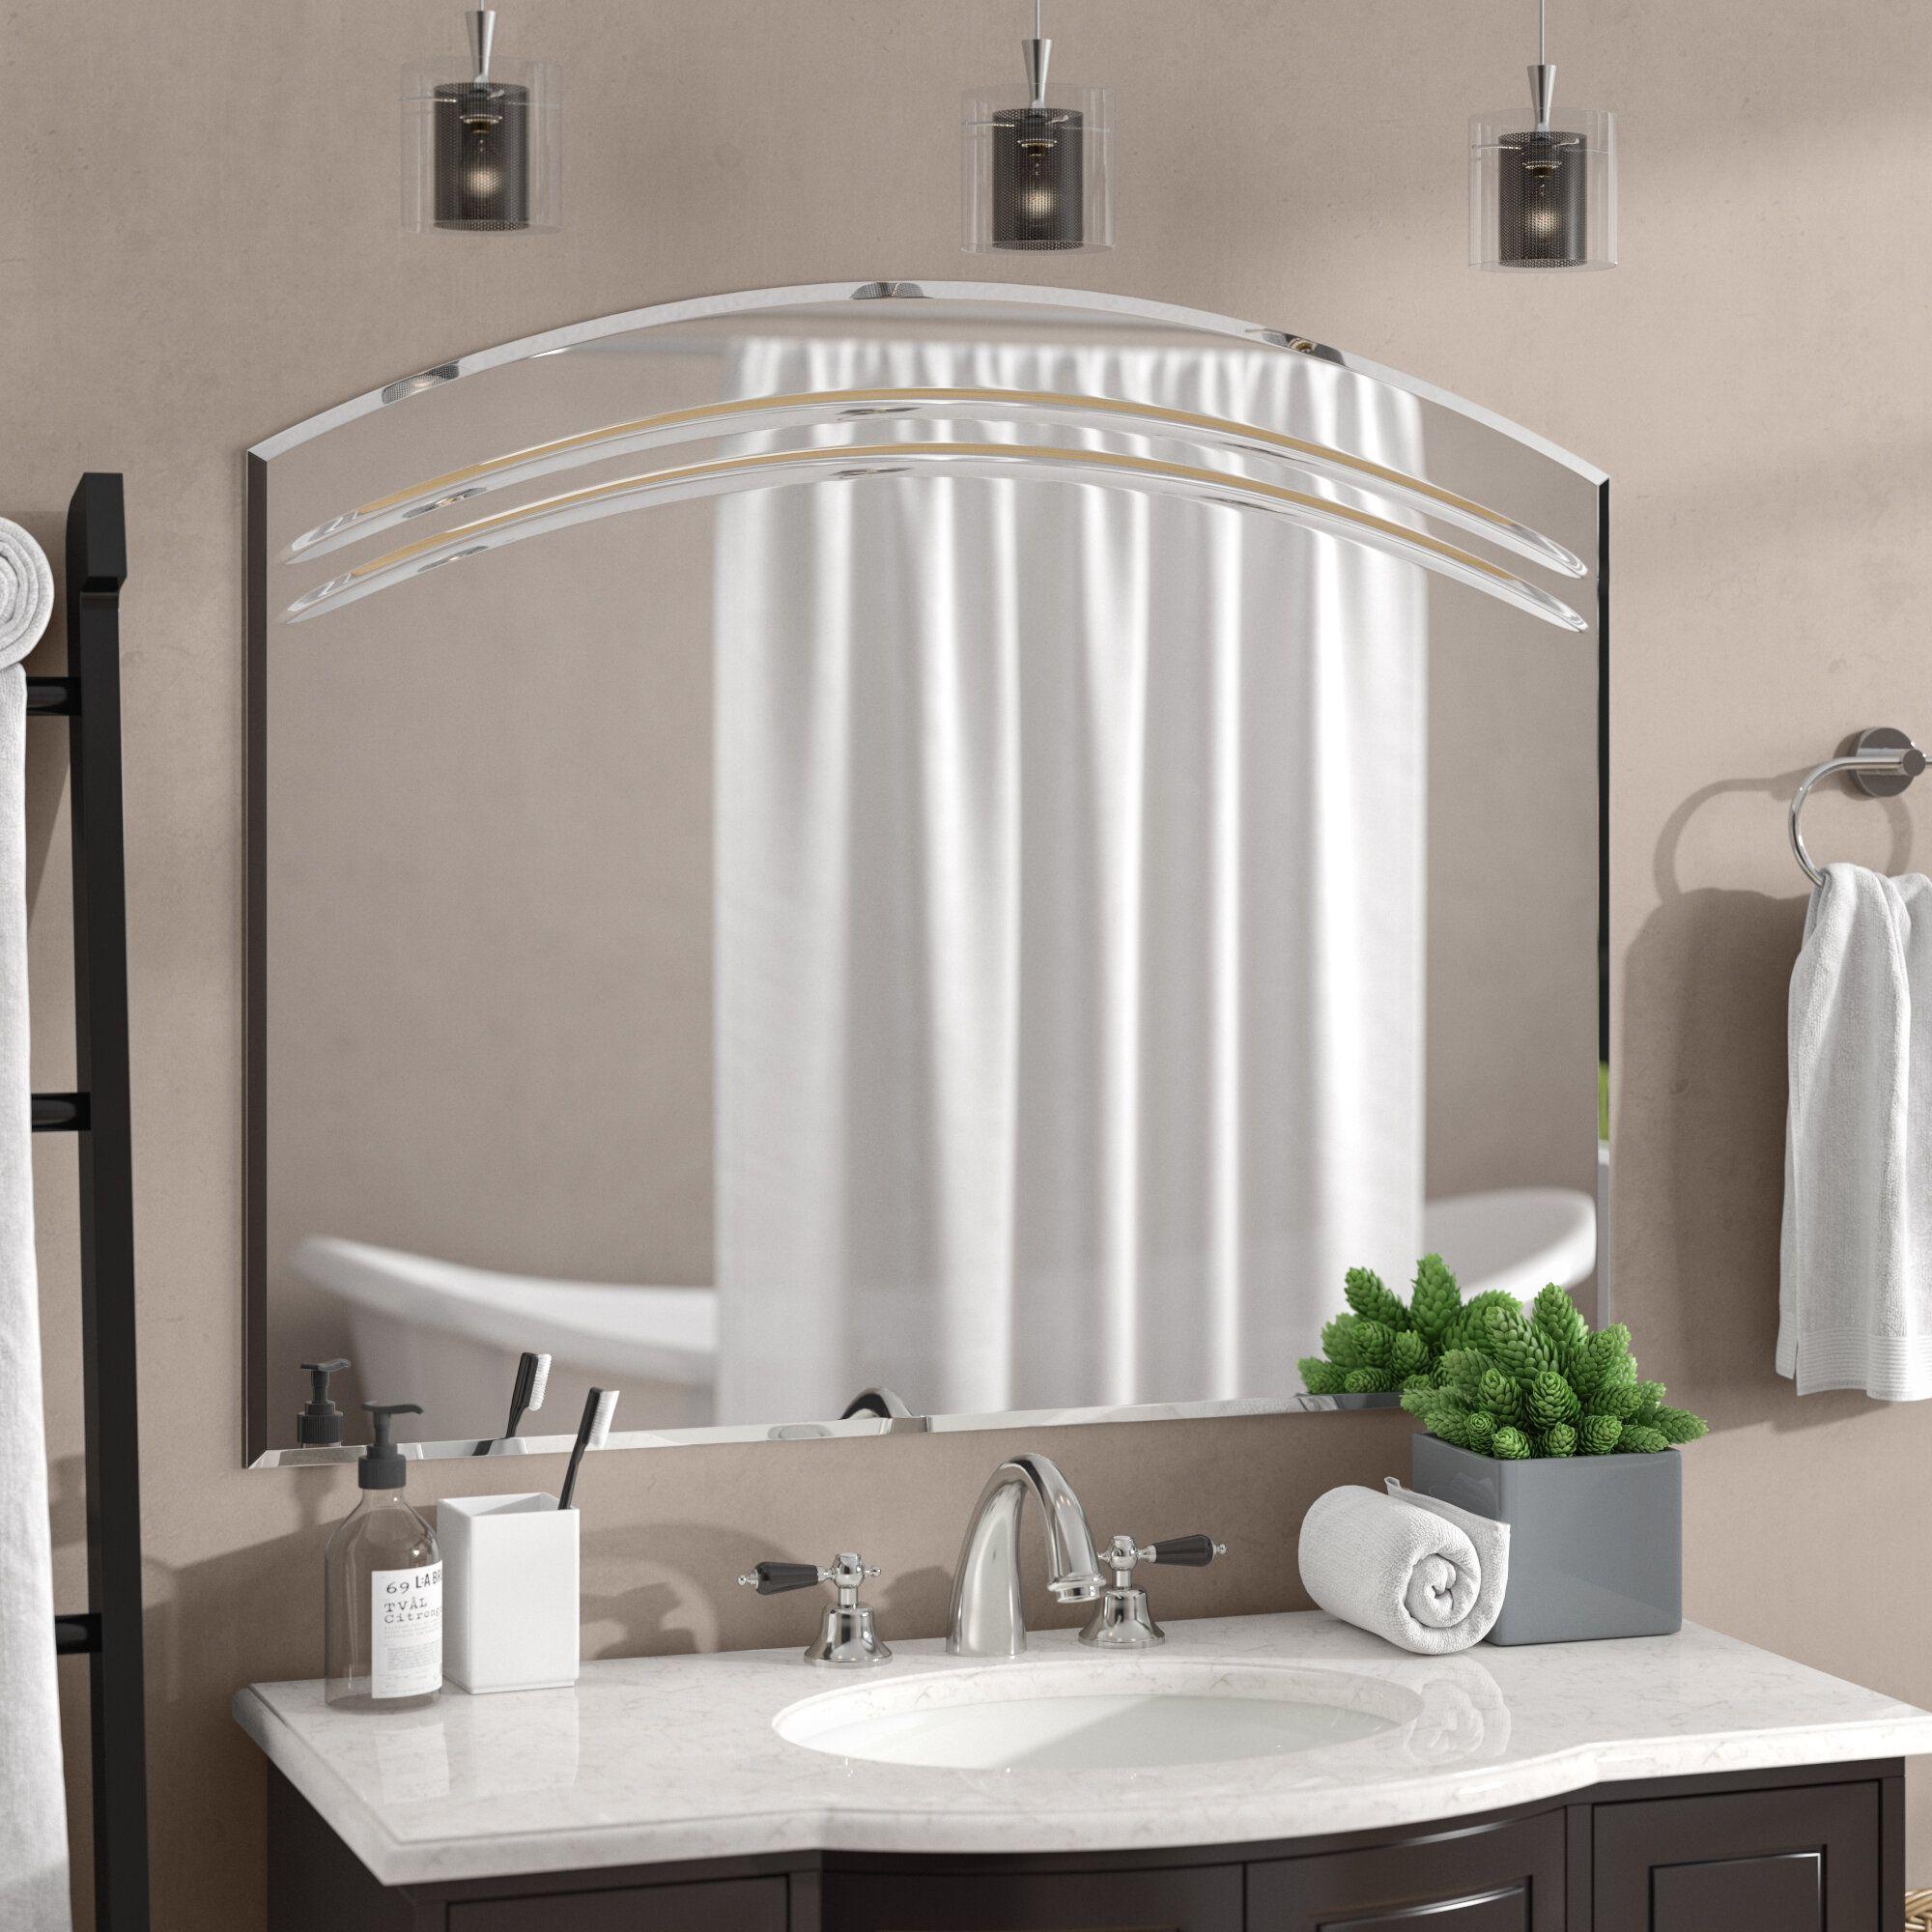 24 Frameless Mirror Ideas And Lighting Glass Vanity Restroom Bathroom Wall Decor Diy Mirror Wall Bathroom Mirror Wall